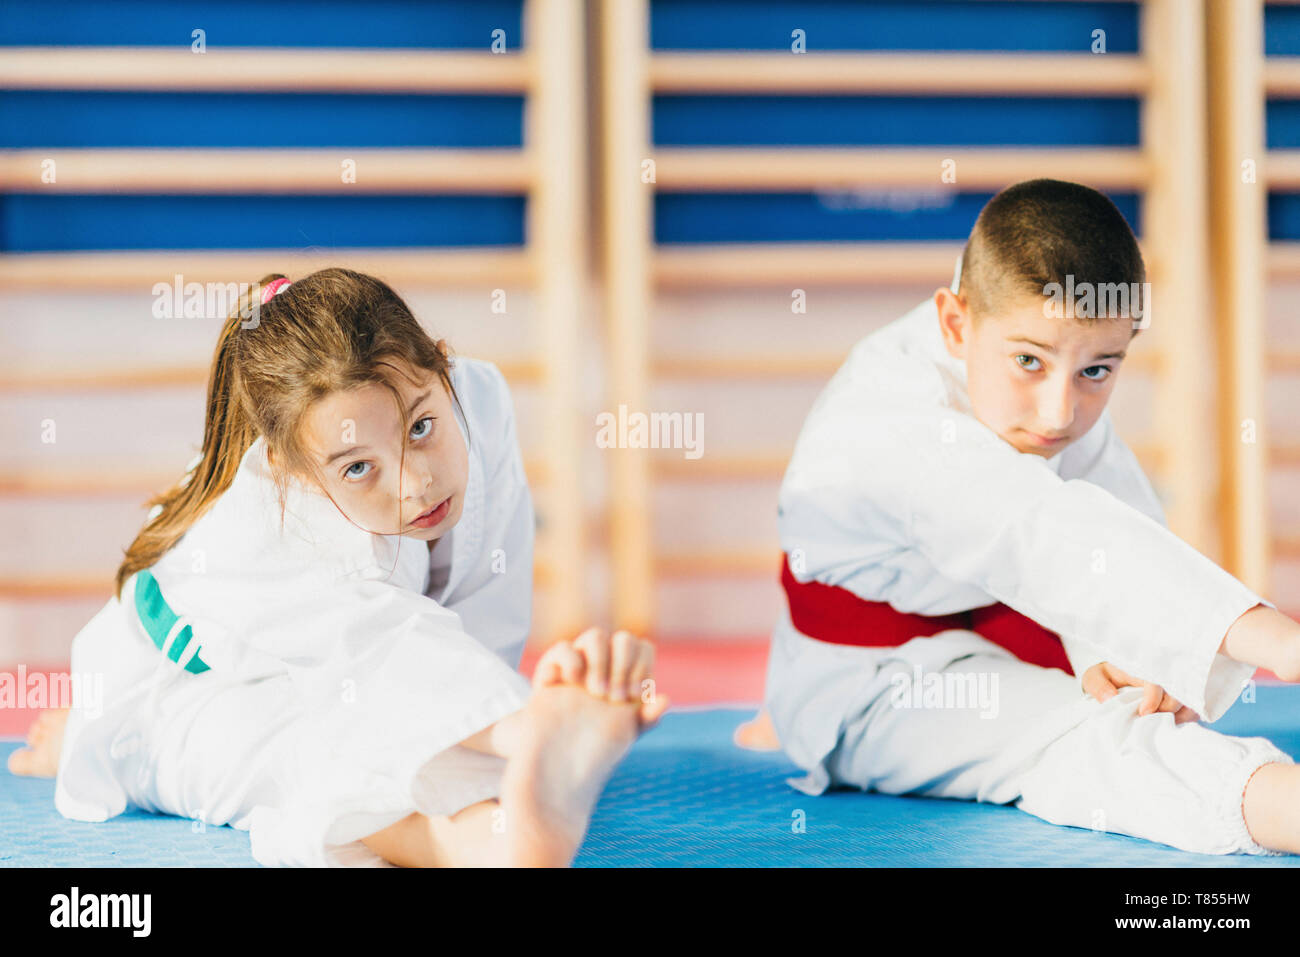 Children stretching in taekwondo class - Stock Image